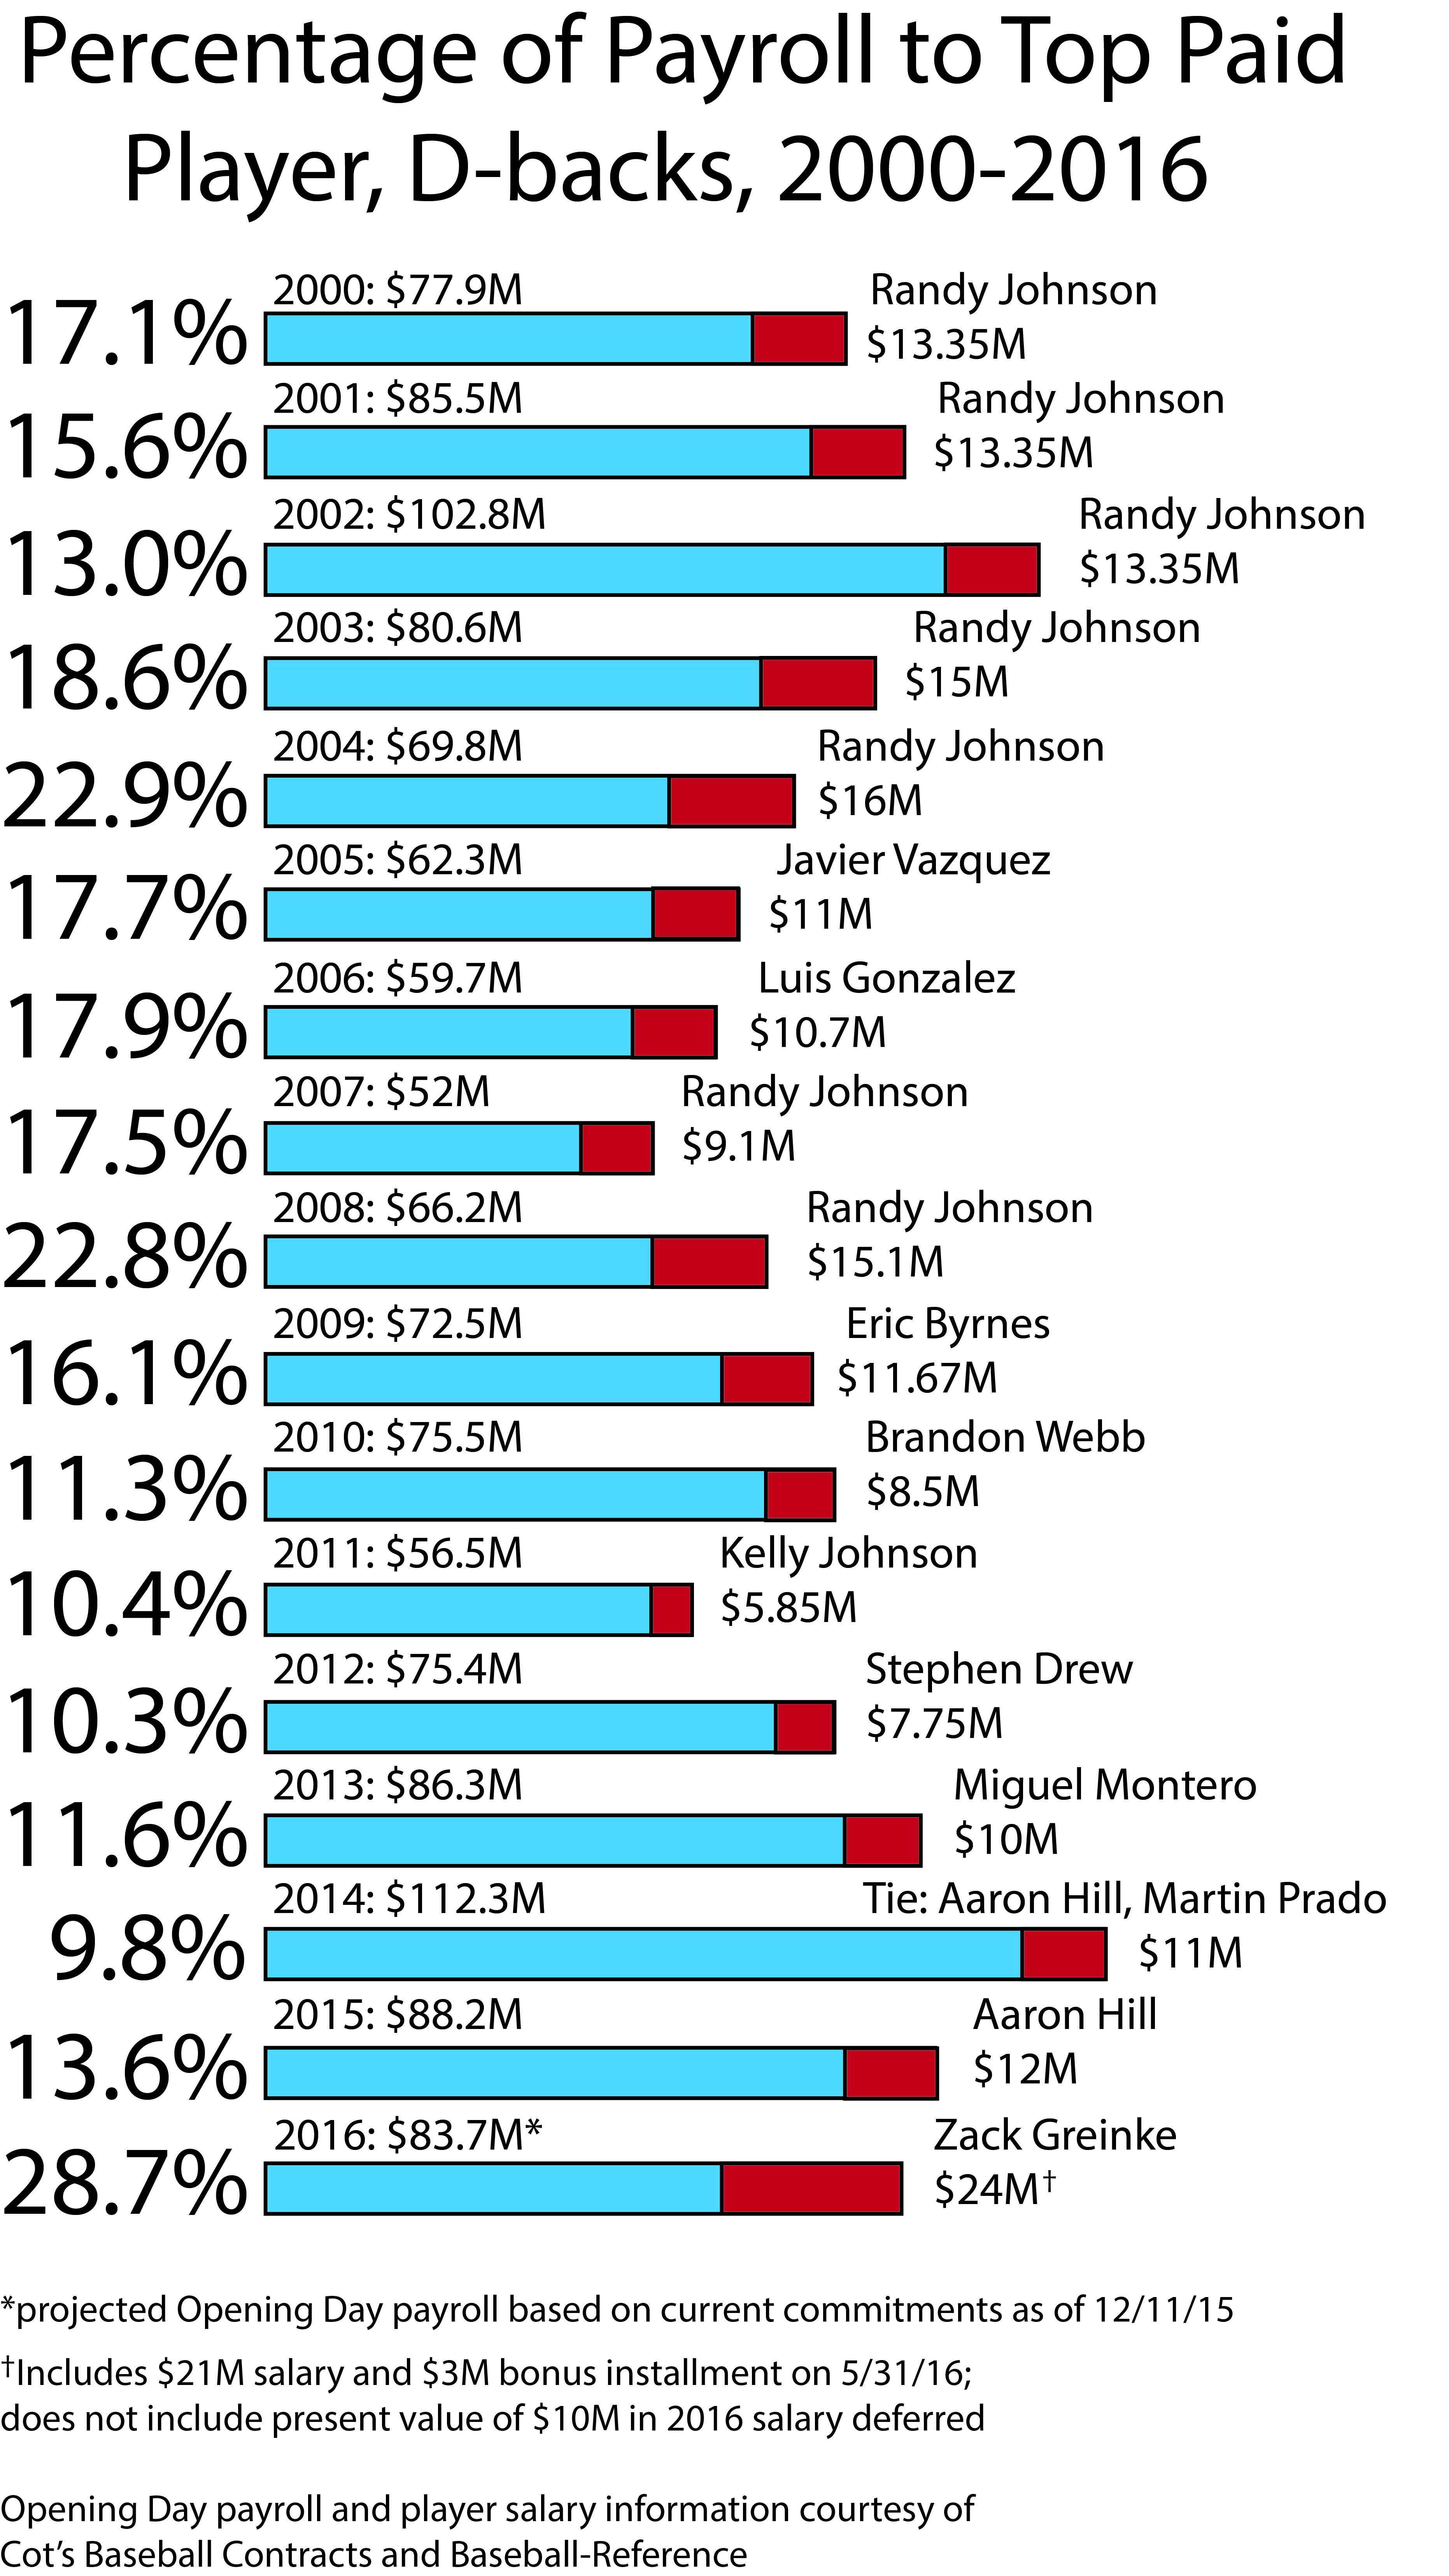 Top Payroll per Season